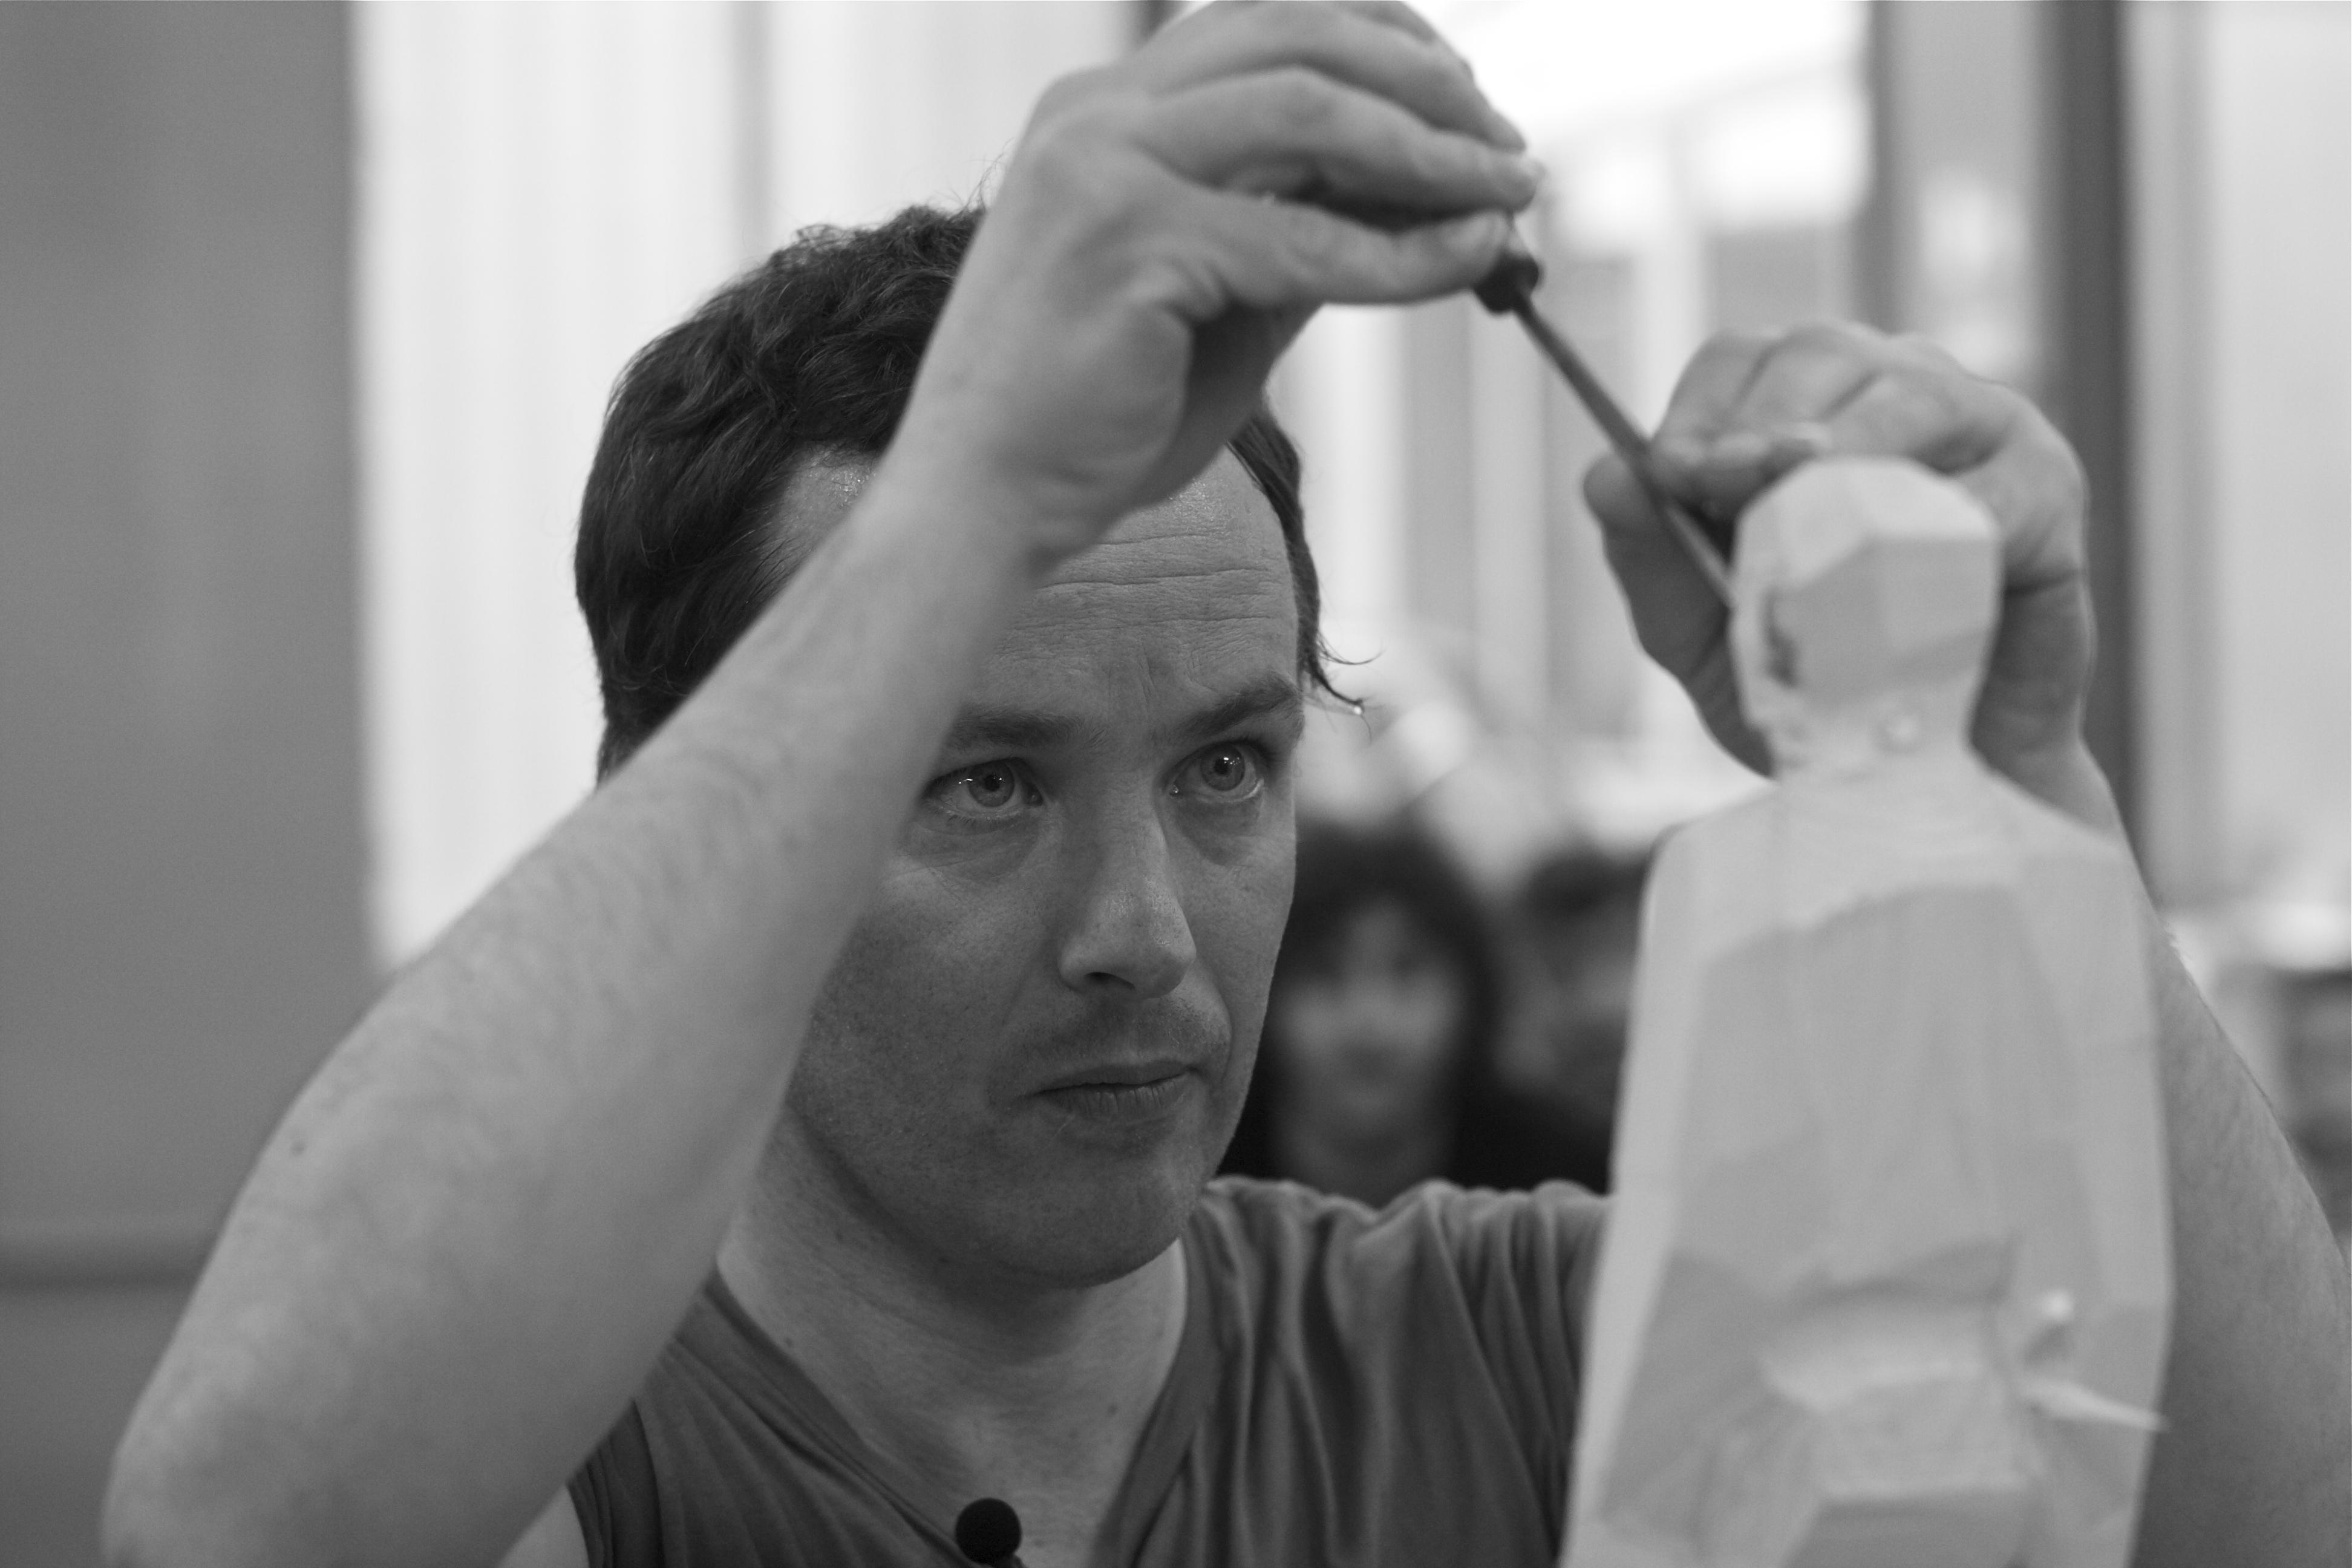 Flickr - Aron Demetz - Dialoghi e materia - Workshop a cura di Franco Reina83